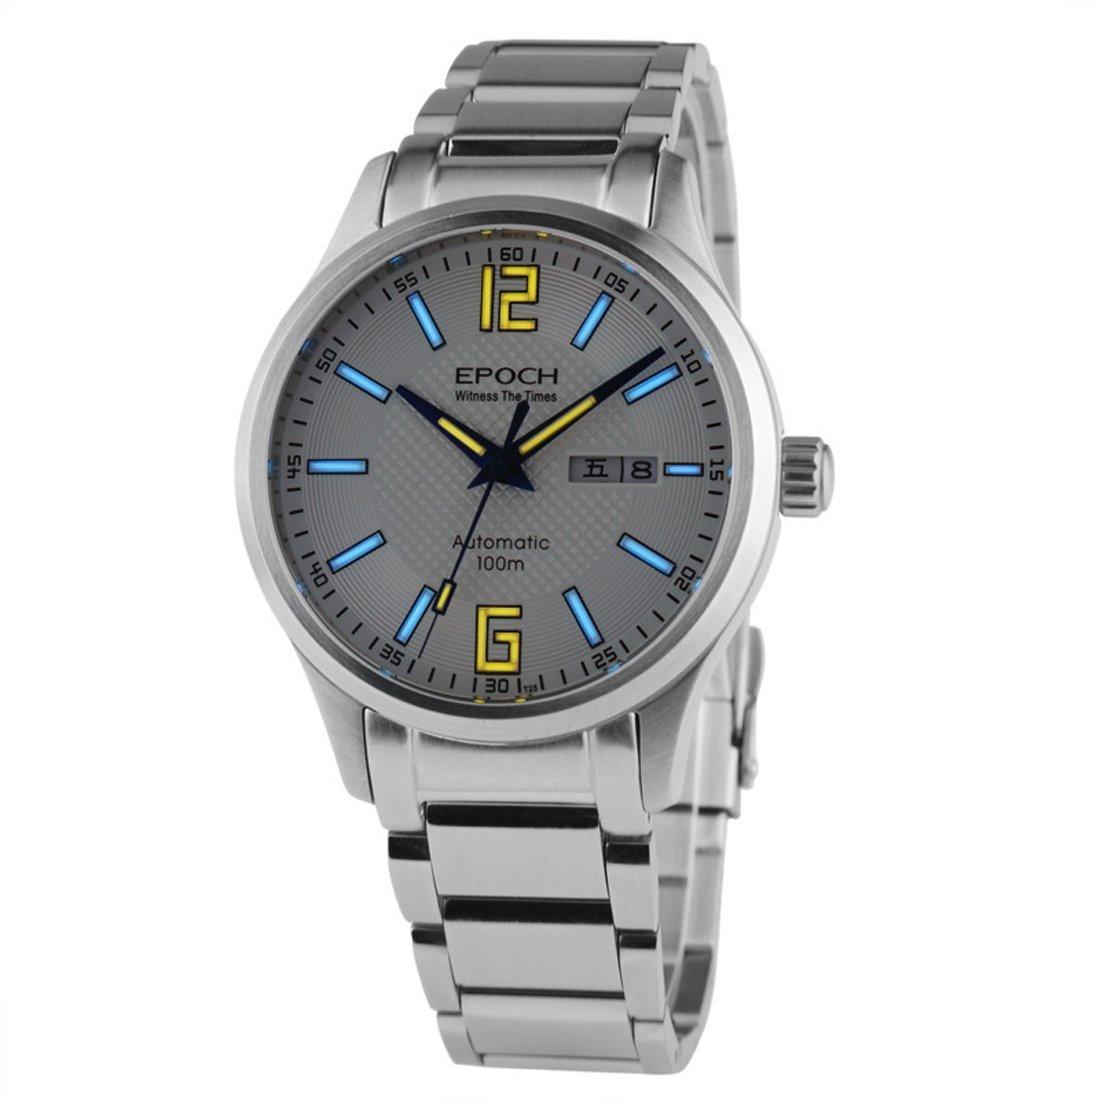 EPOCH 7012G steel strap waterproof 100m tritium gas luminous white dial steel strap mens business automatic mechanical watch